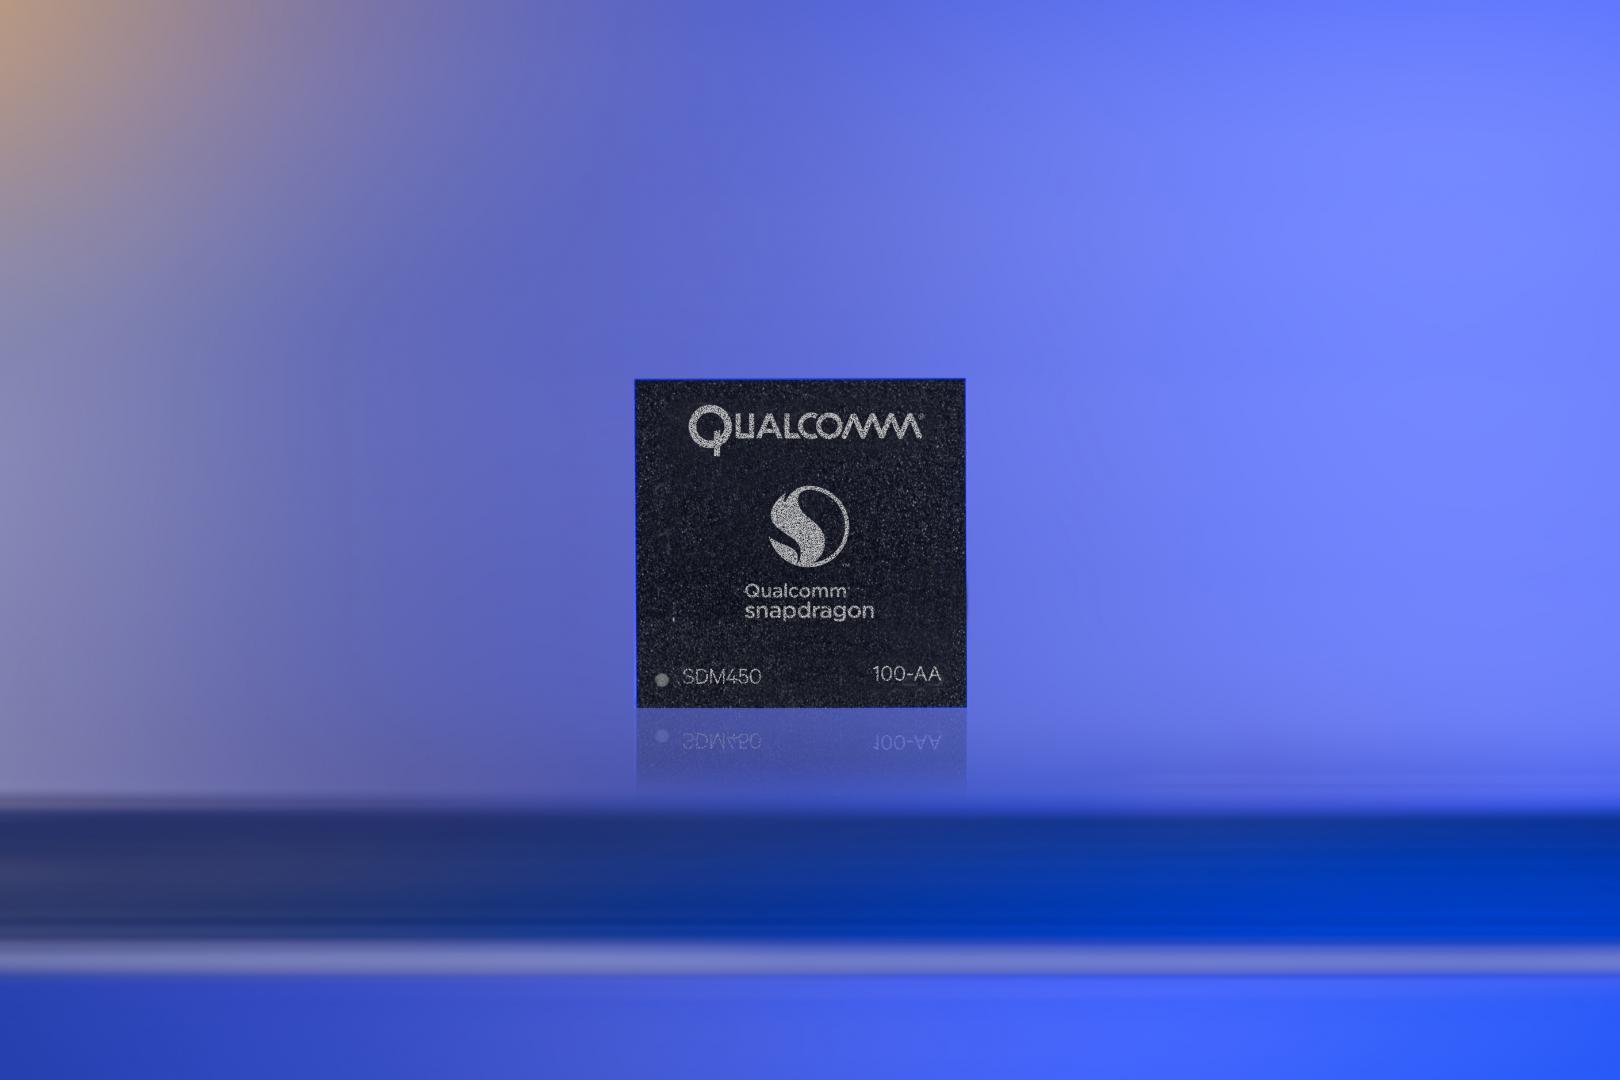 Qualcomm's Snapdragon 450 chip.